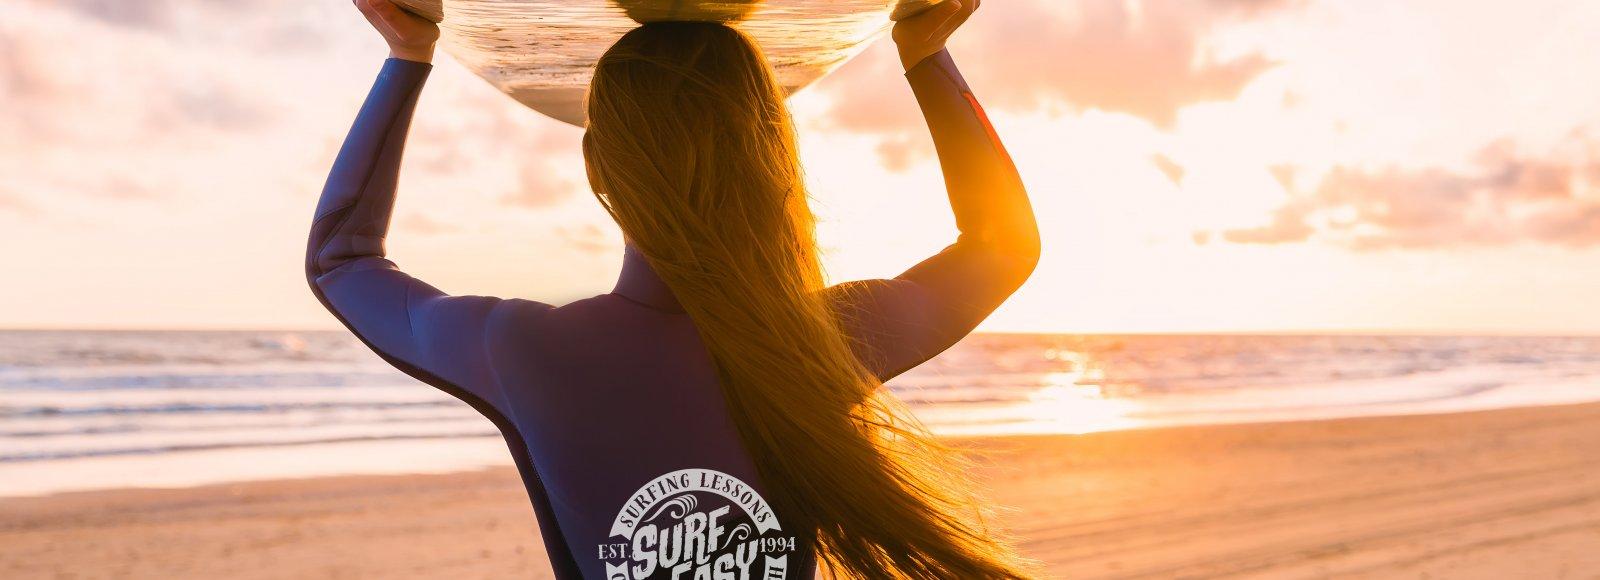 Sunrise Surfing Surf Easy